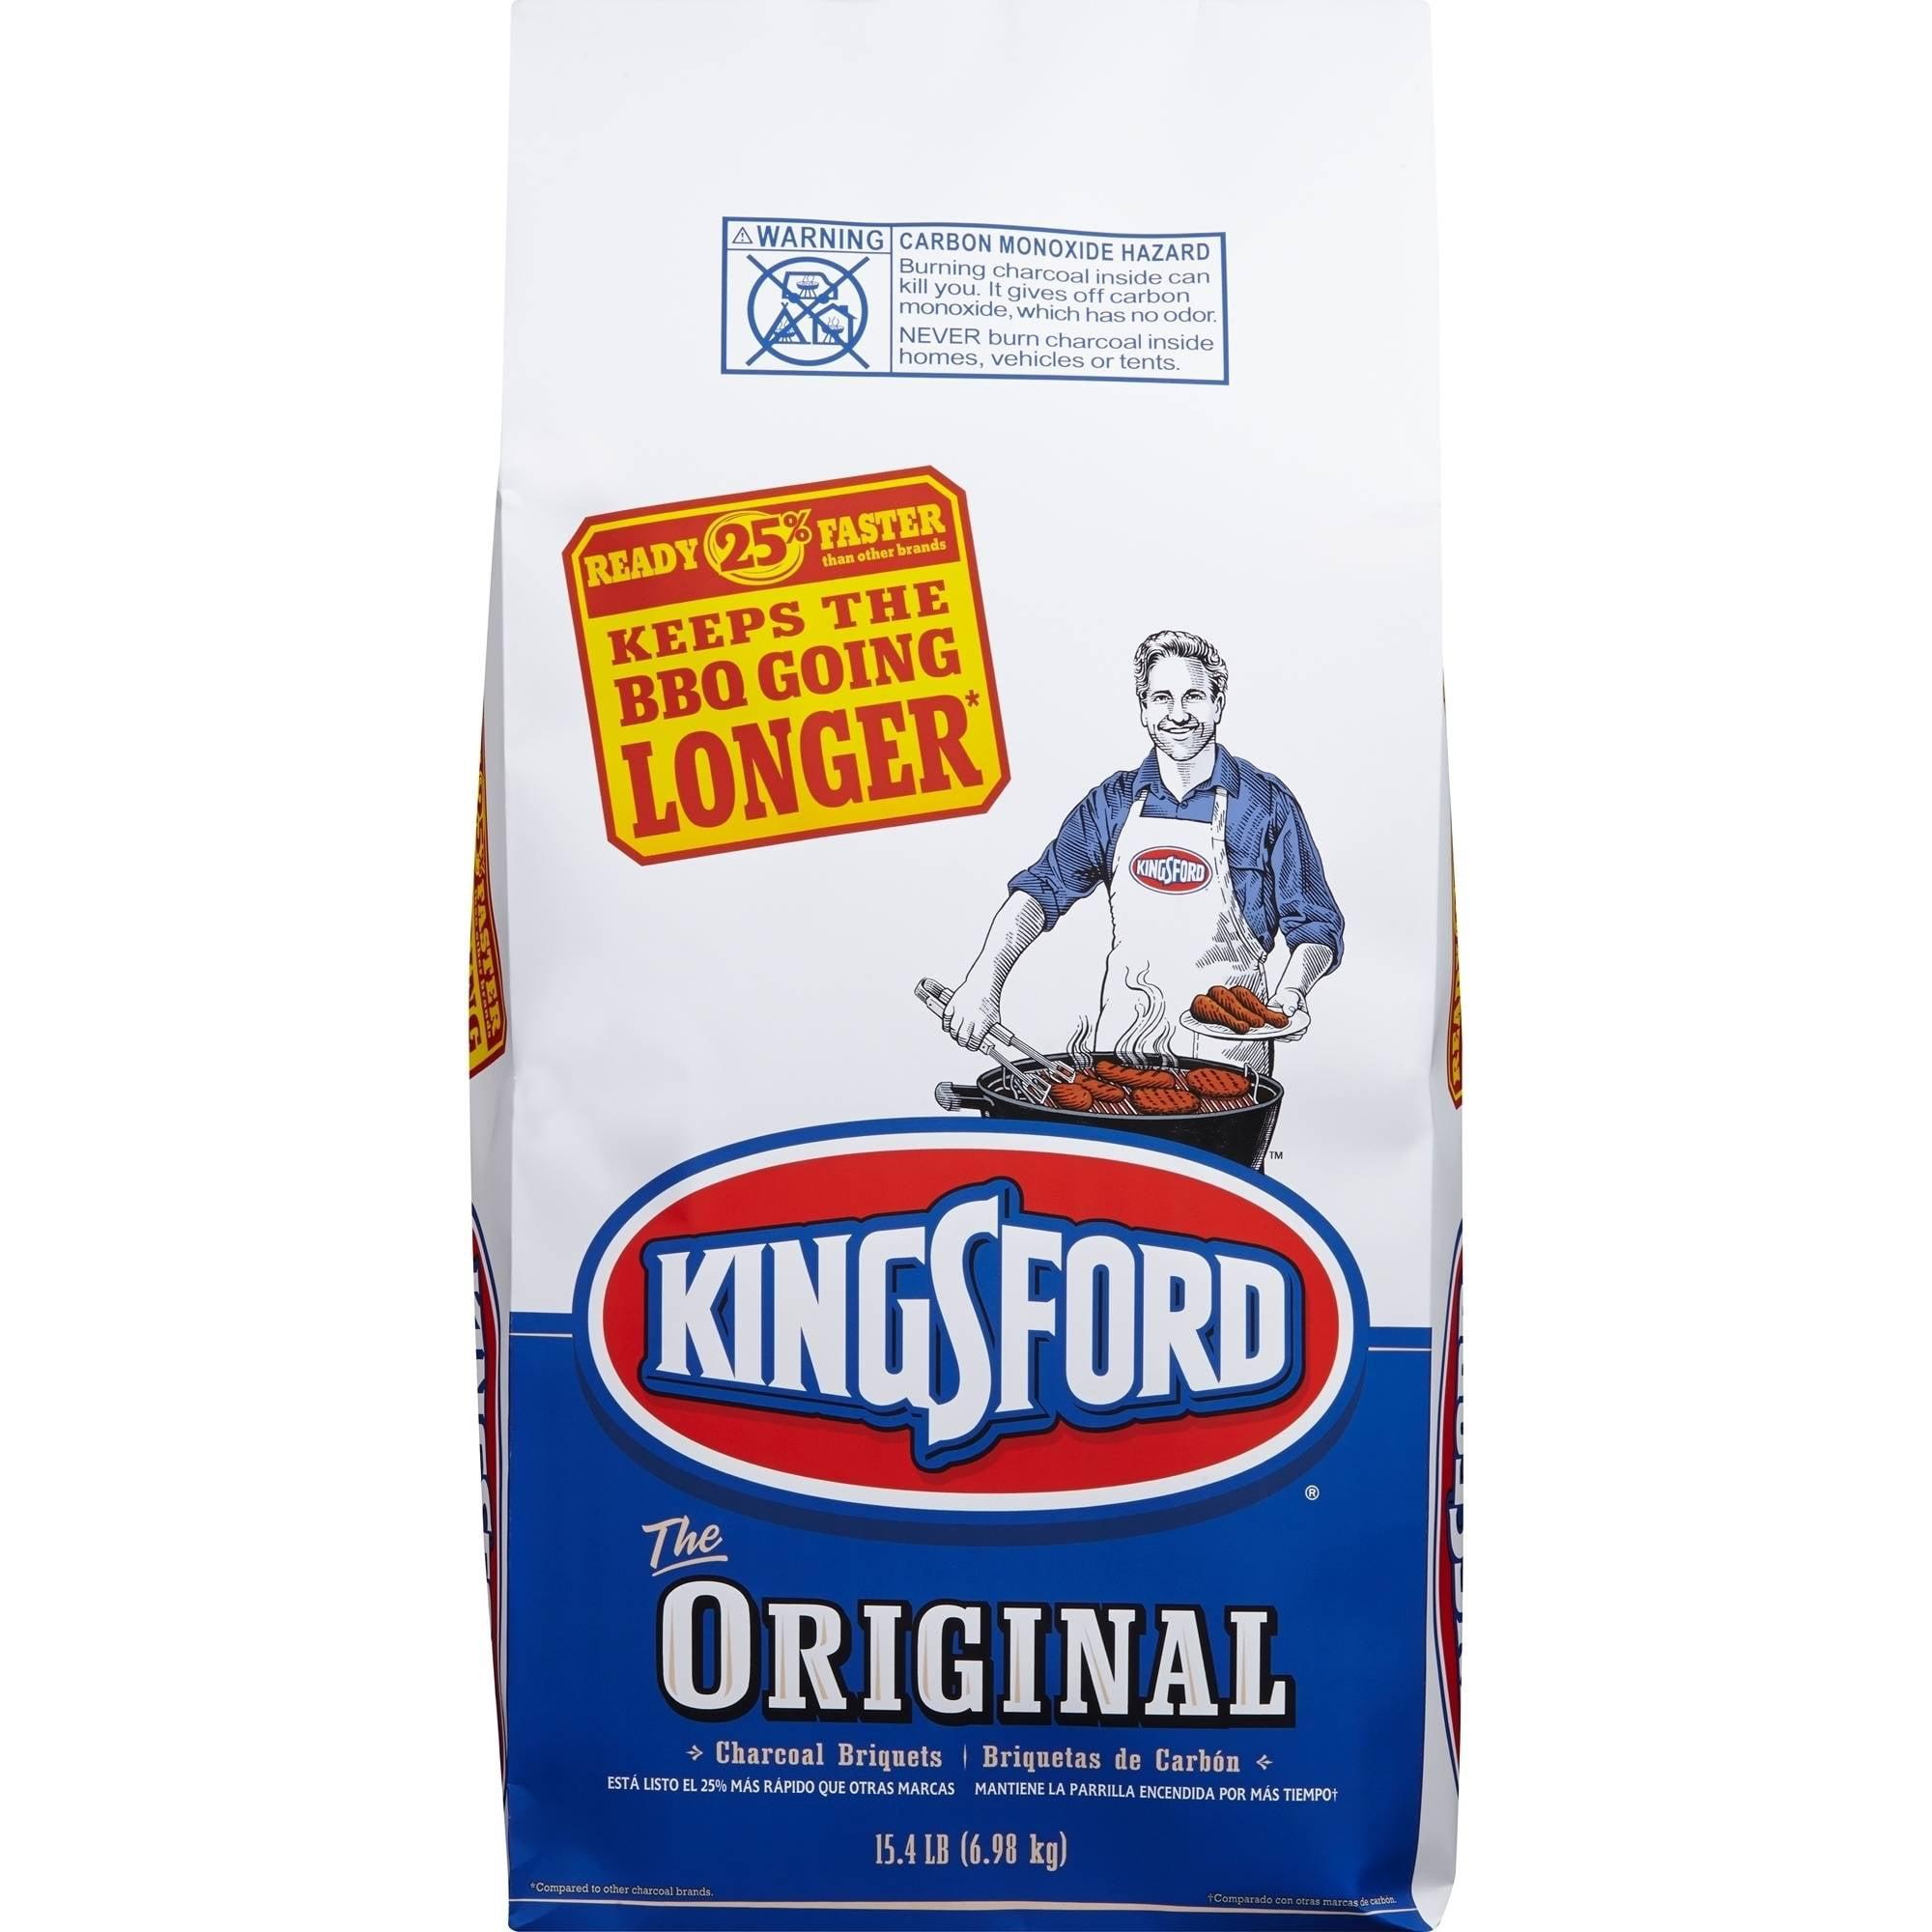 Kingsford Charcoal Briquets, 15.40 lbs